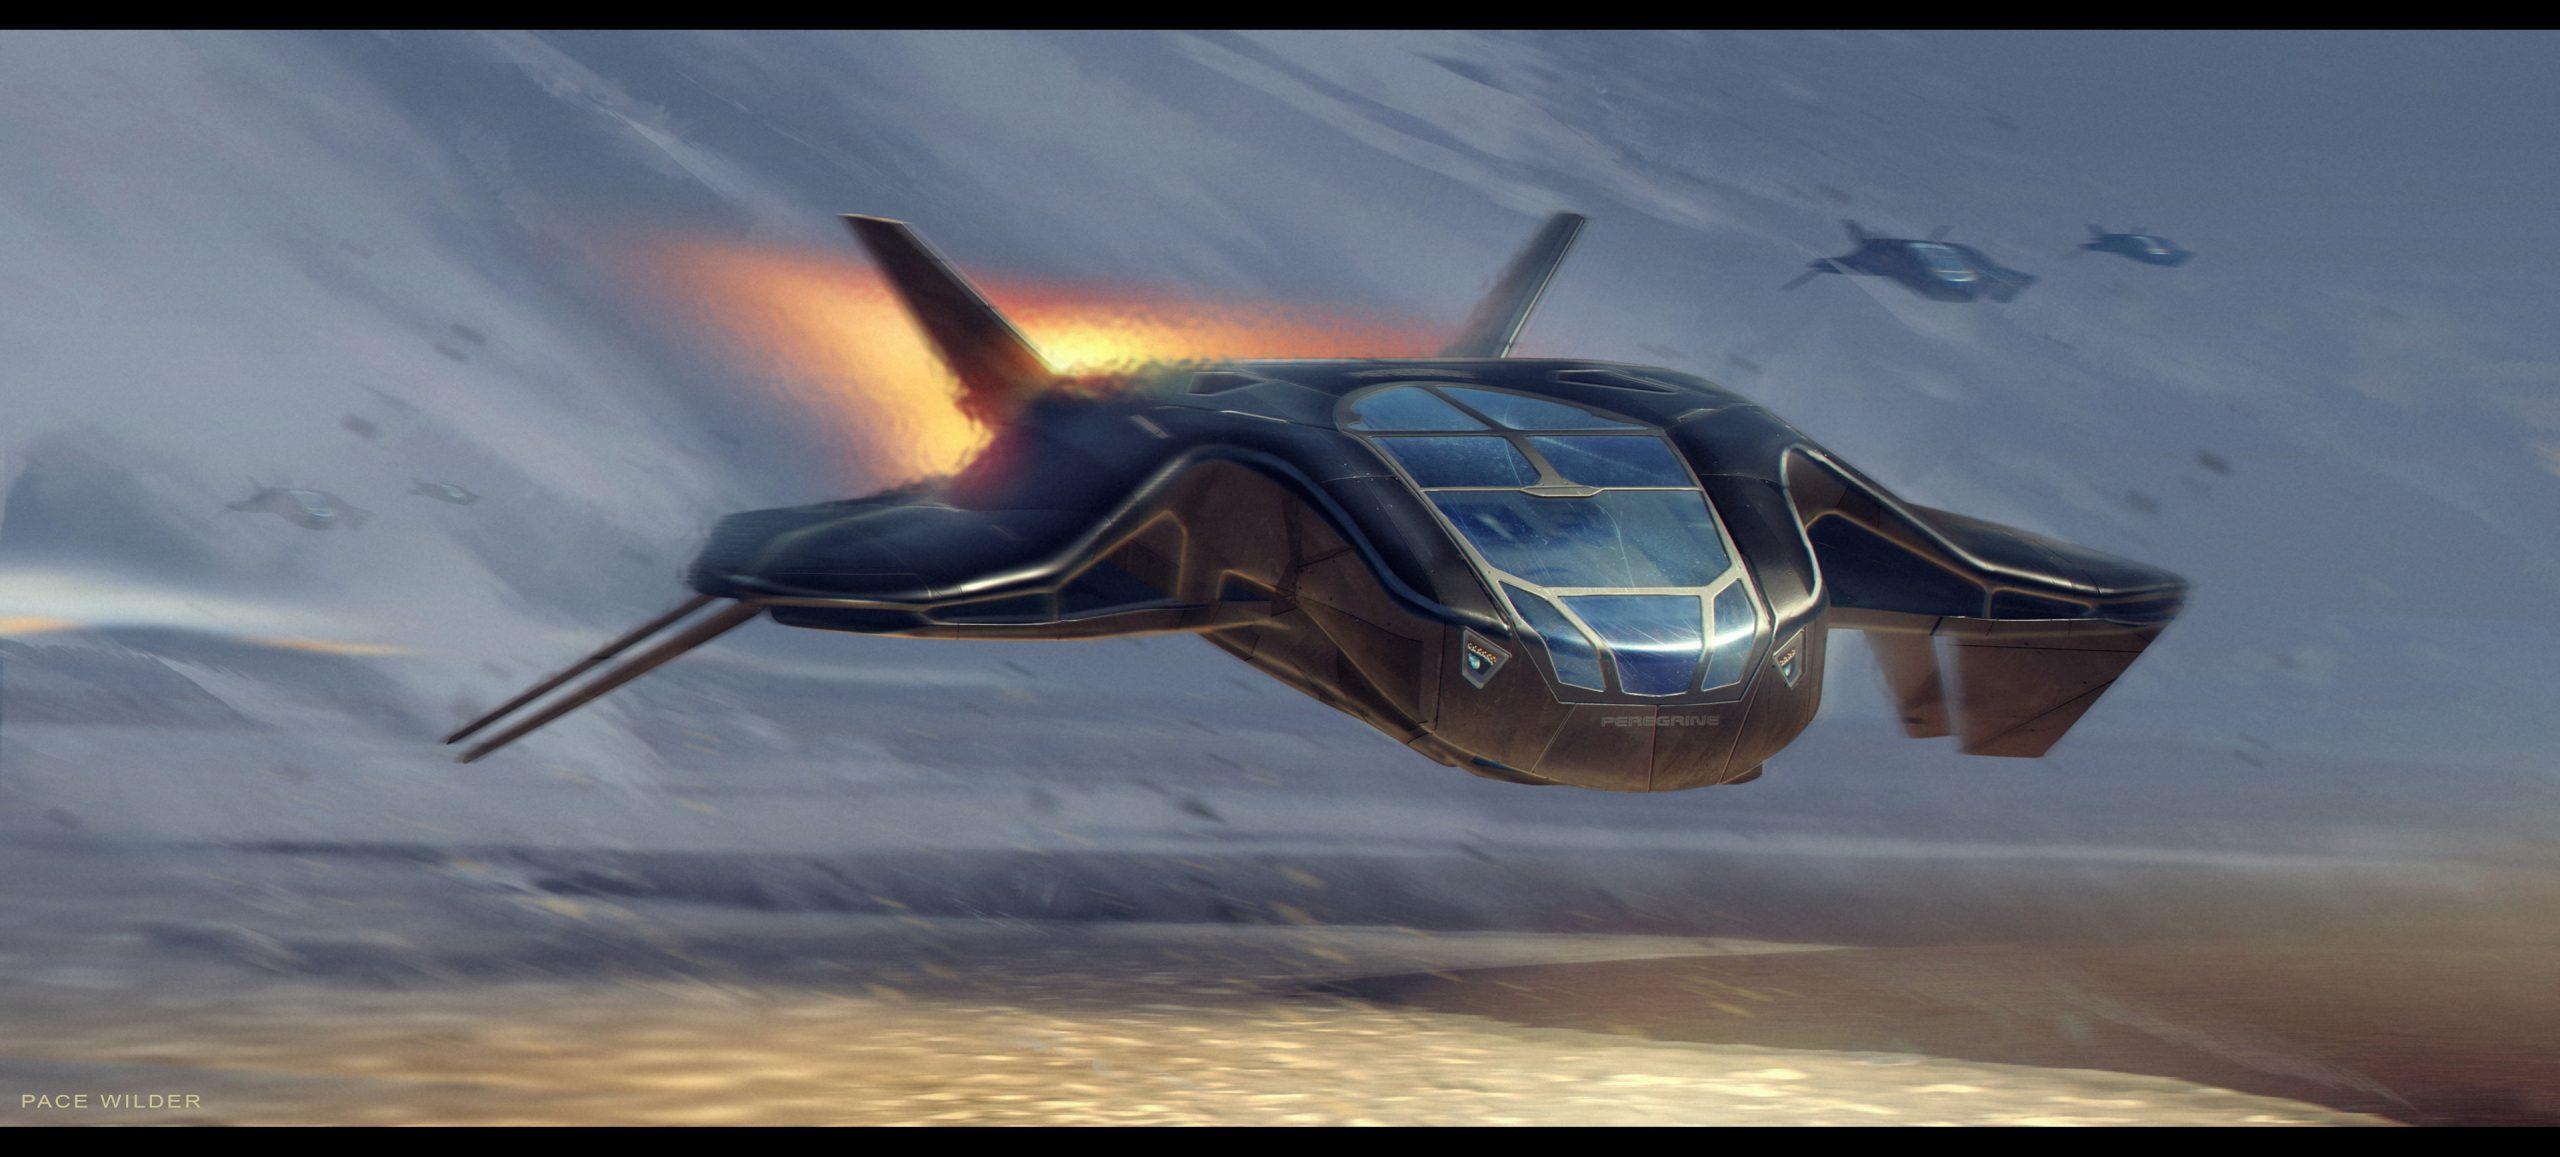 Artwork of a futuristic space ship